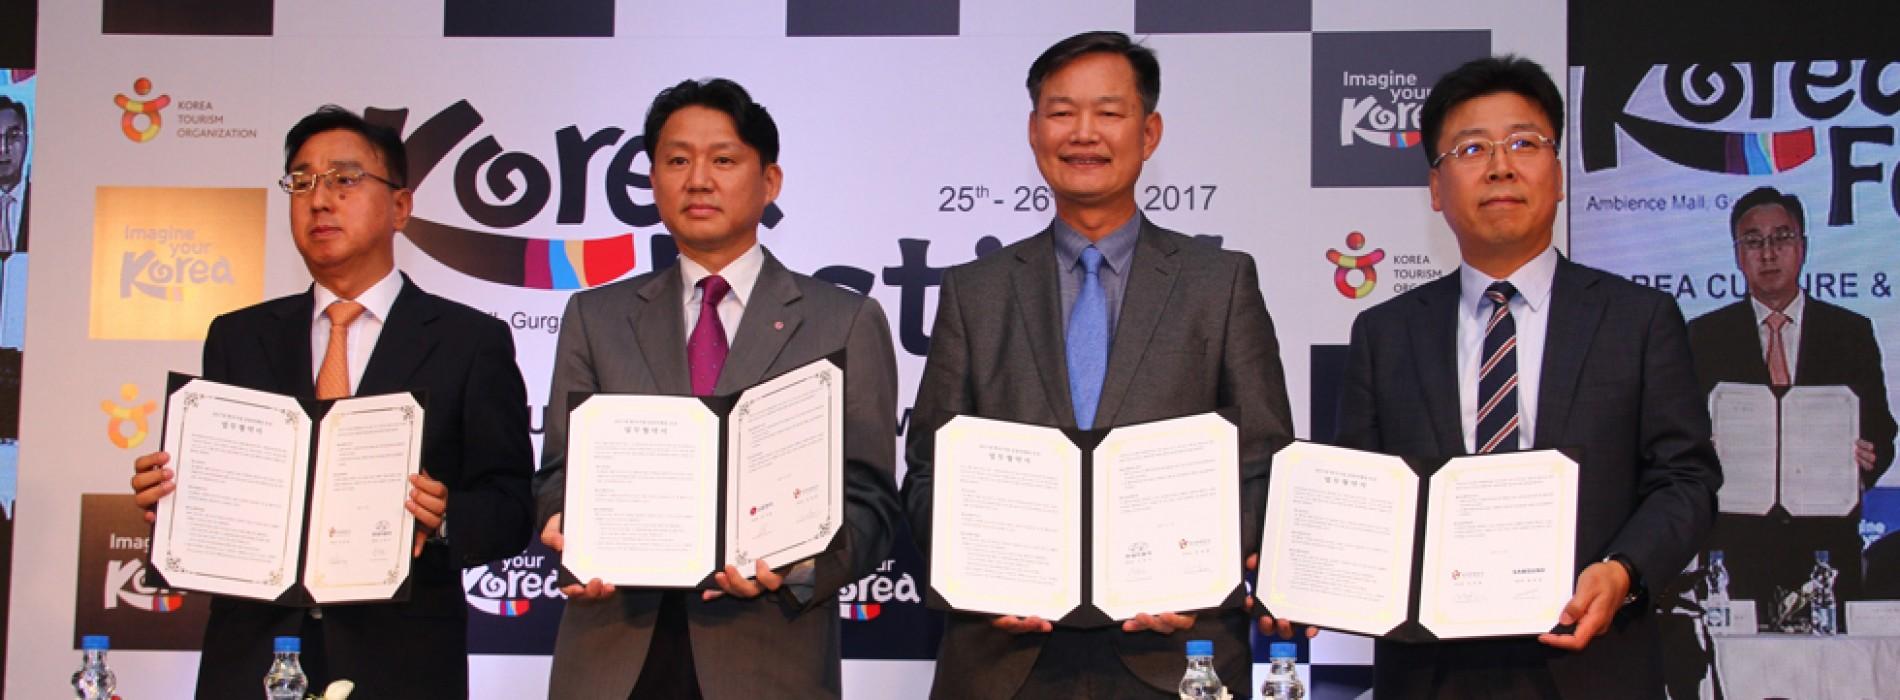 A grand South Korean Grandeur in the city – Korea Culture and Tourism Festival 2017